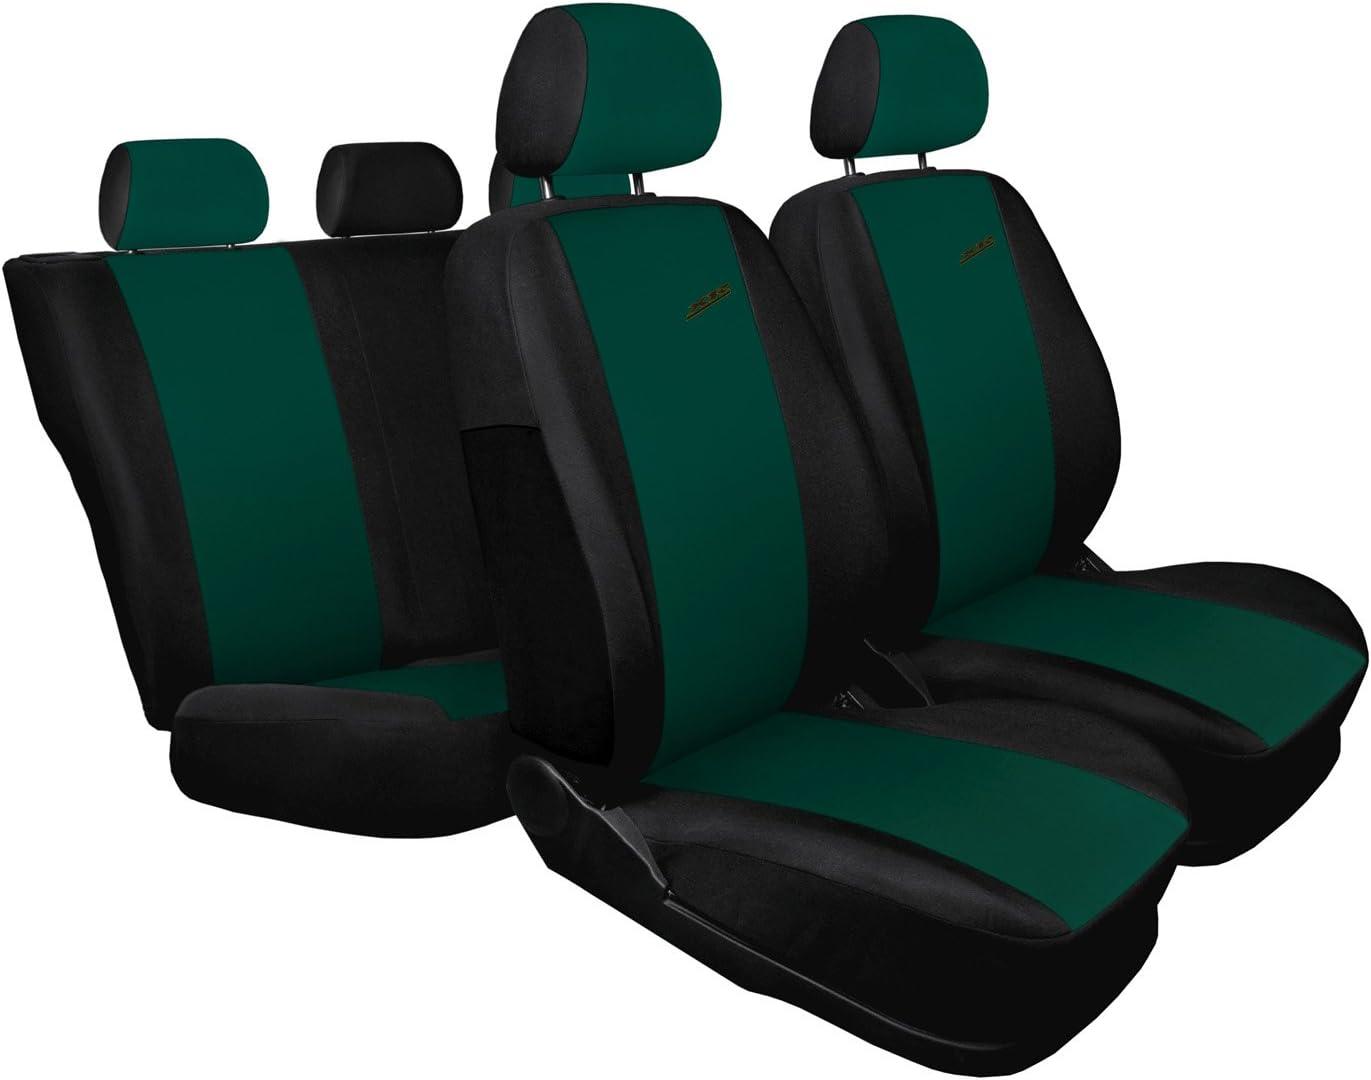 GSC Sitzbez/üge Universal Schonbez/üge kompatibel mit VW Polo Classic